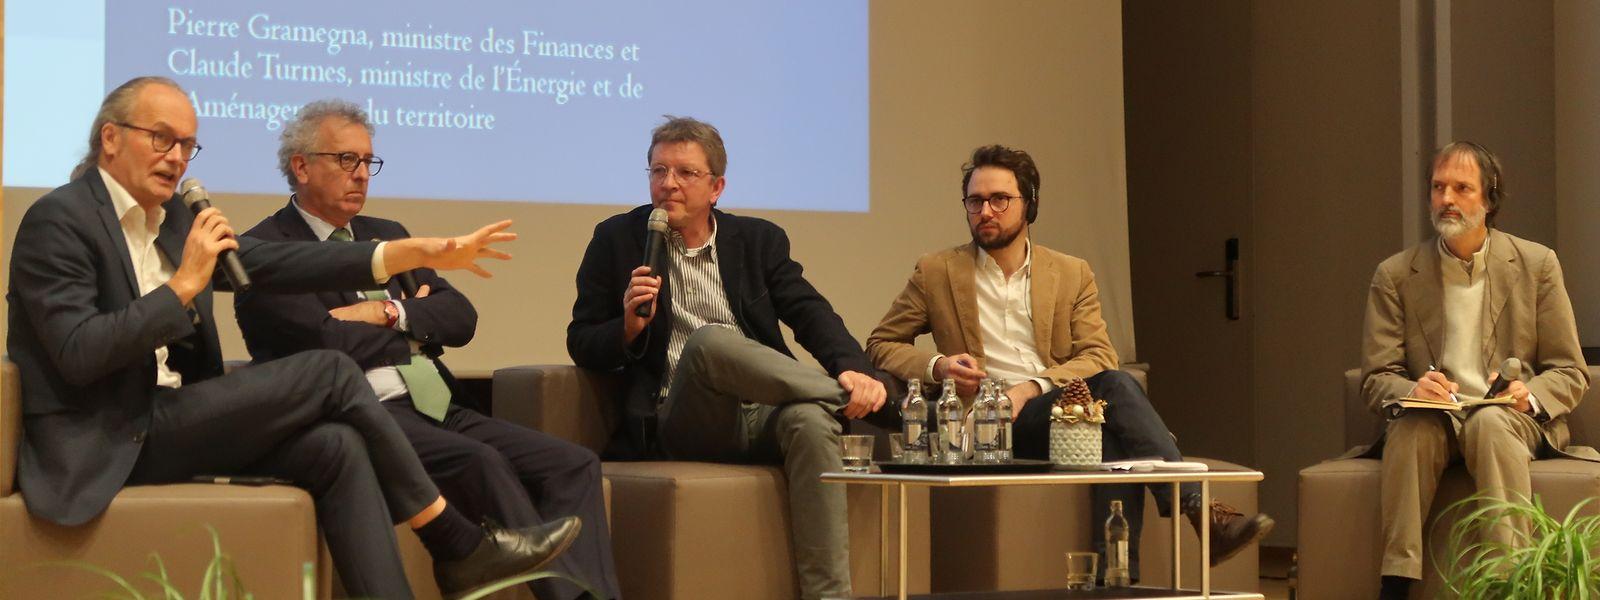 Energieminister Claude Turmes (Déi Gréng), Finanzminister Pierre Gramegna (DP), Moderator Maurice Molitor sowie die Wirtschaftswissenschaftler Lucas Chancel und Kai Schlegelmilch (v.l.n.r.).